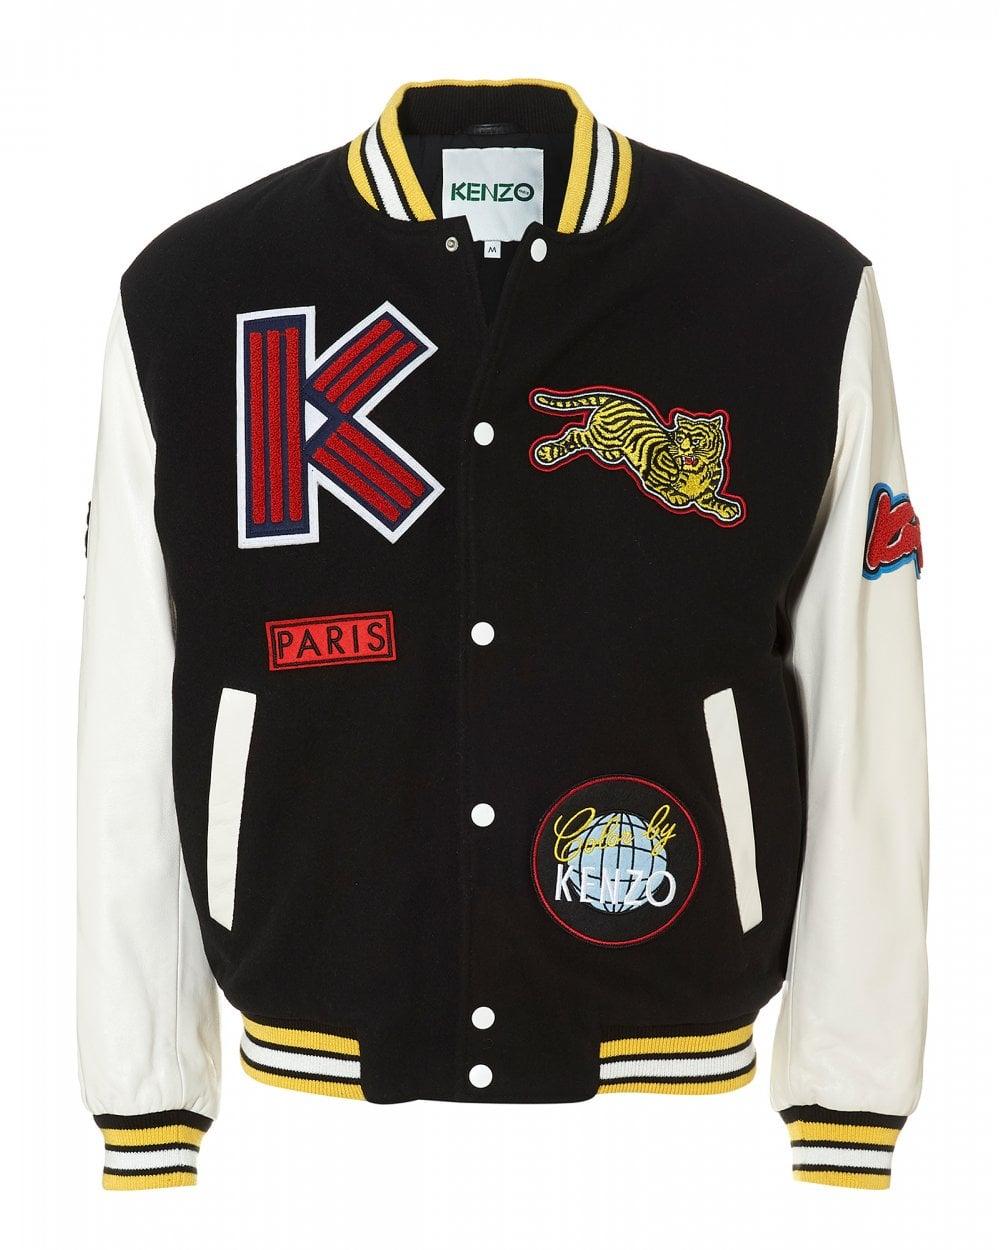 0bf39dea800 Kenzo Mens Patchwork Varsity Jacket